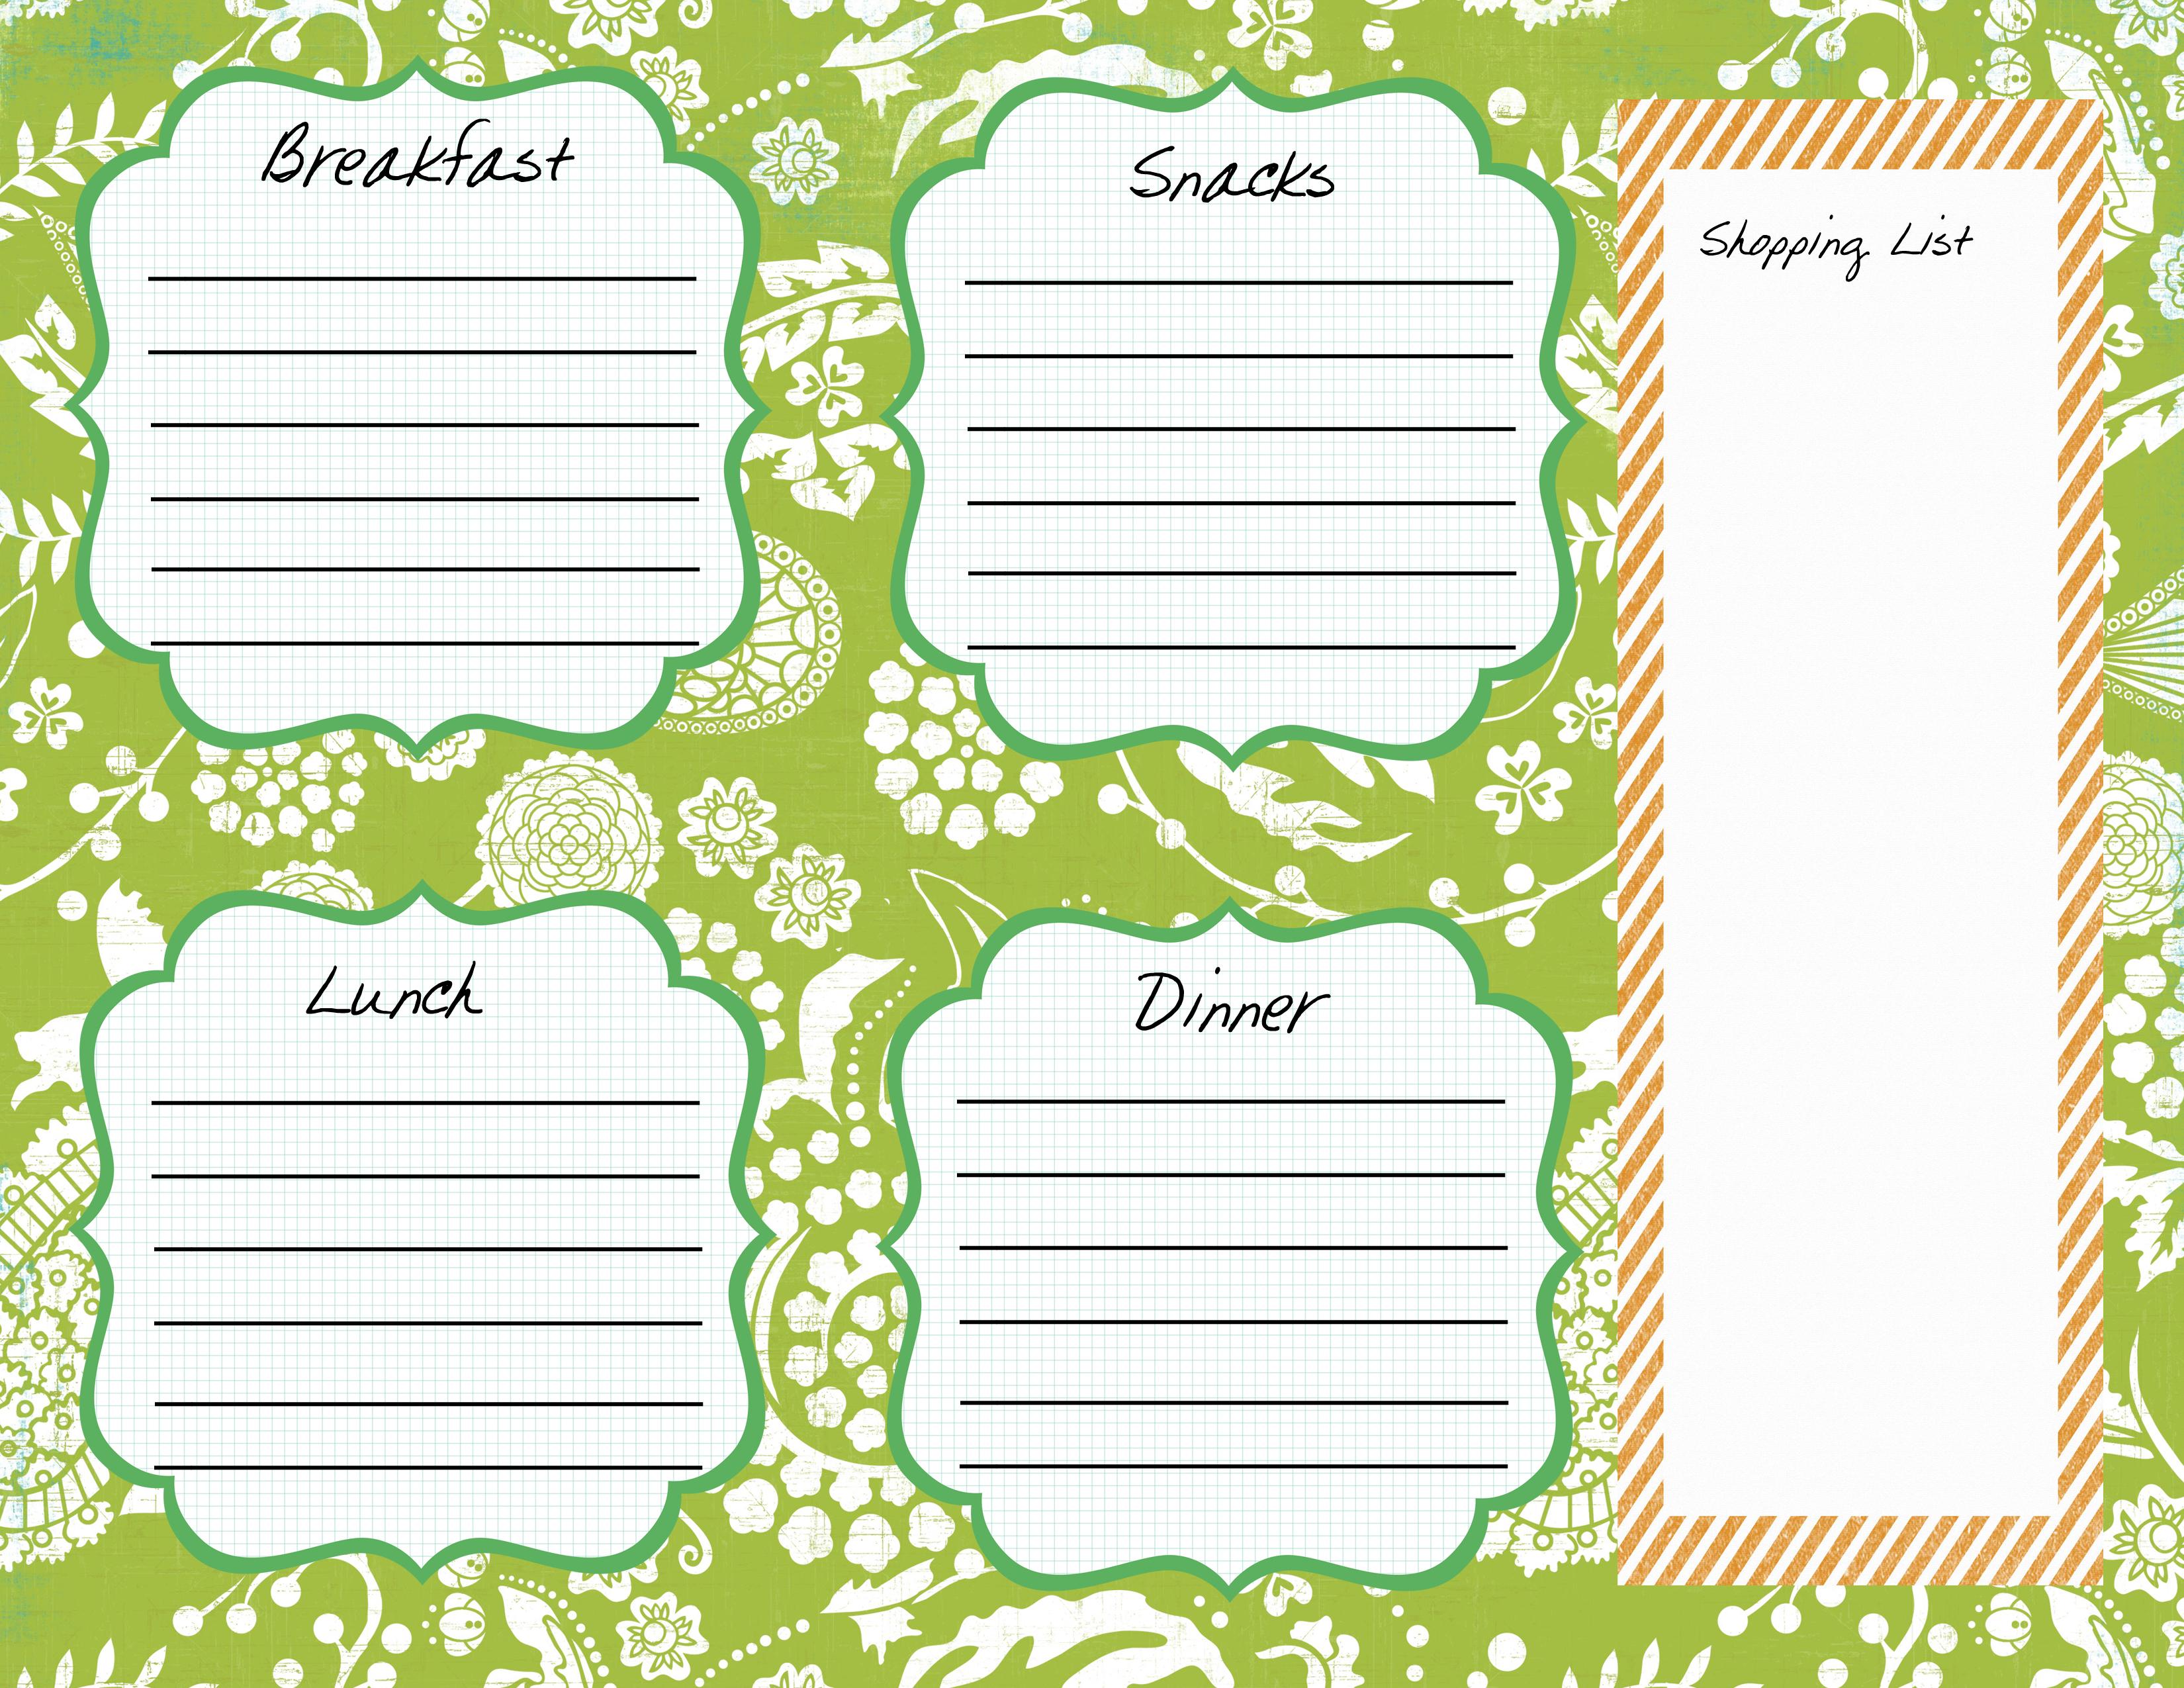 My Meal Plan Worksheet – Meal Plan Worksheet